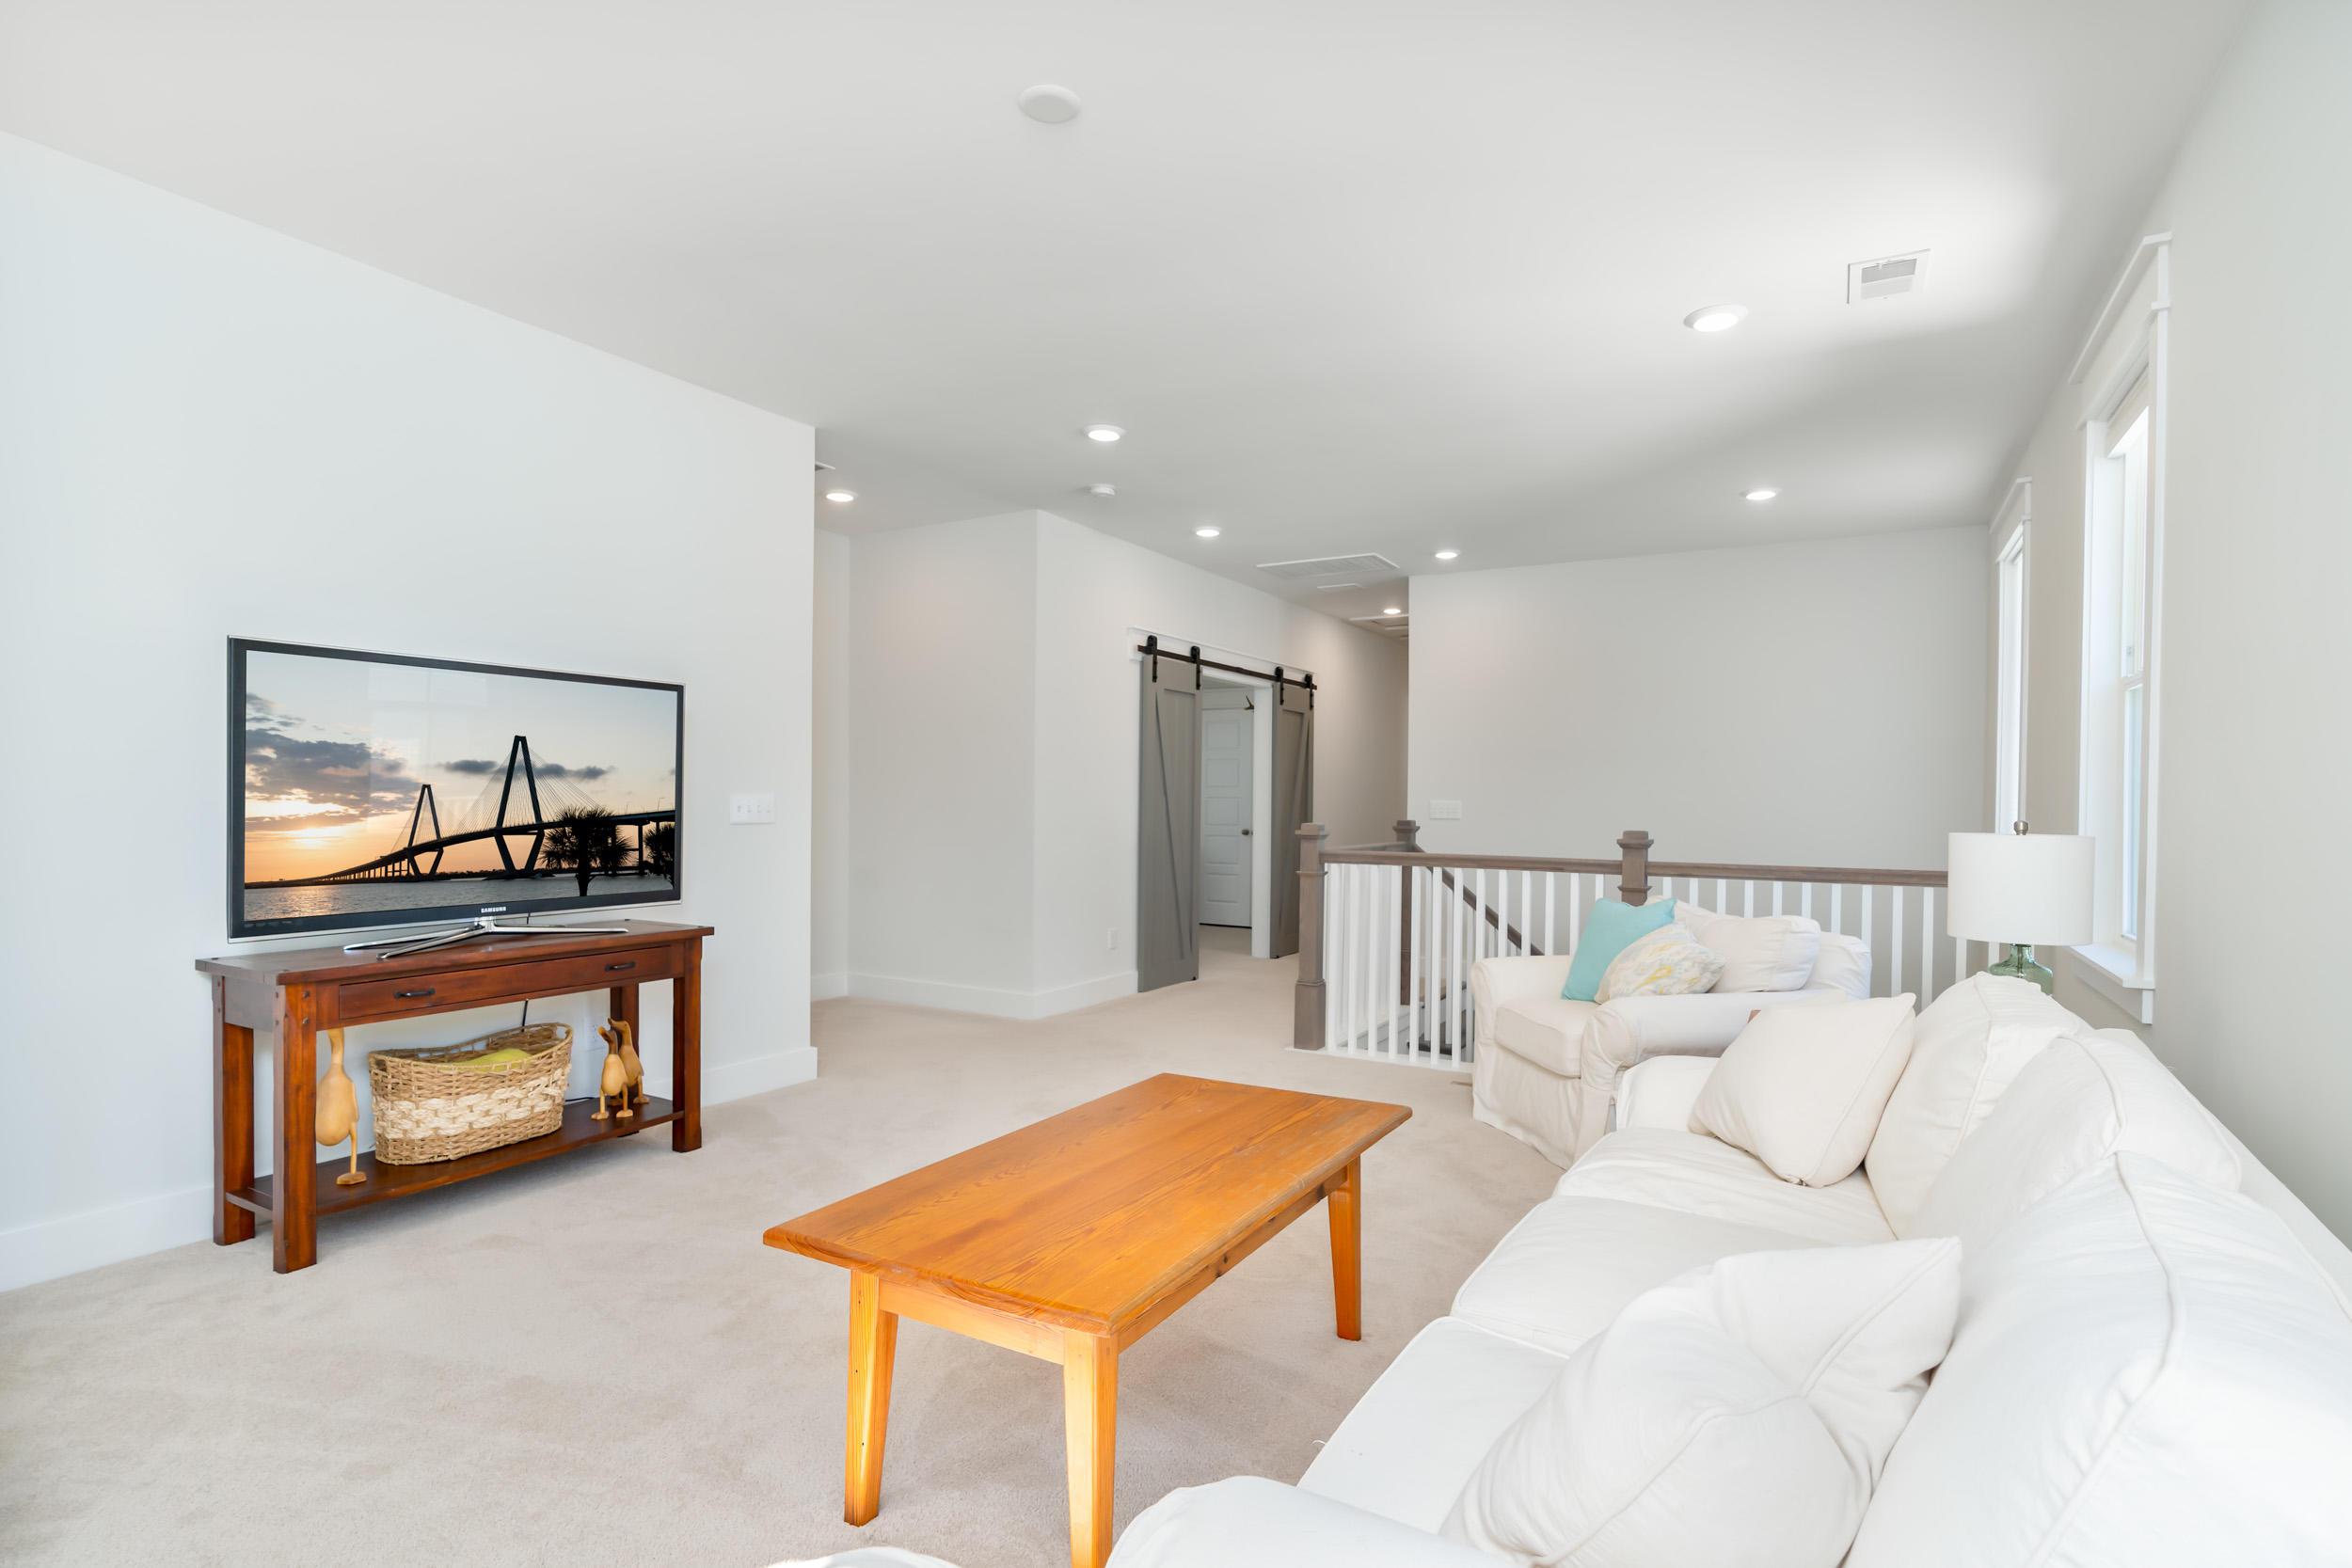 Hamlin Oaks Homes For Sale - 2921 Tranquility, Mount Pleasant, SC - 20